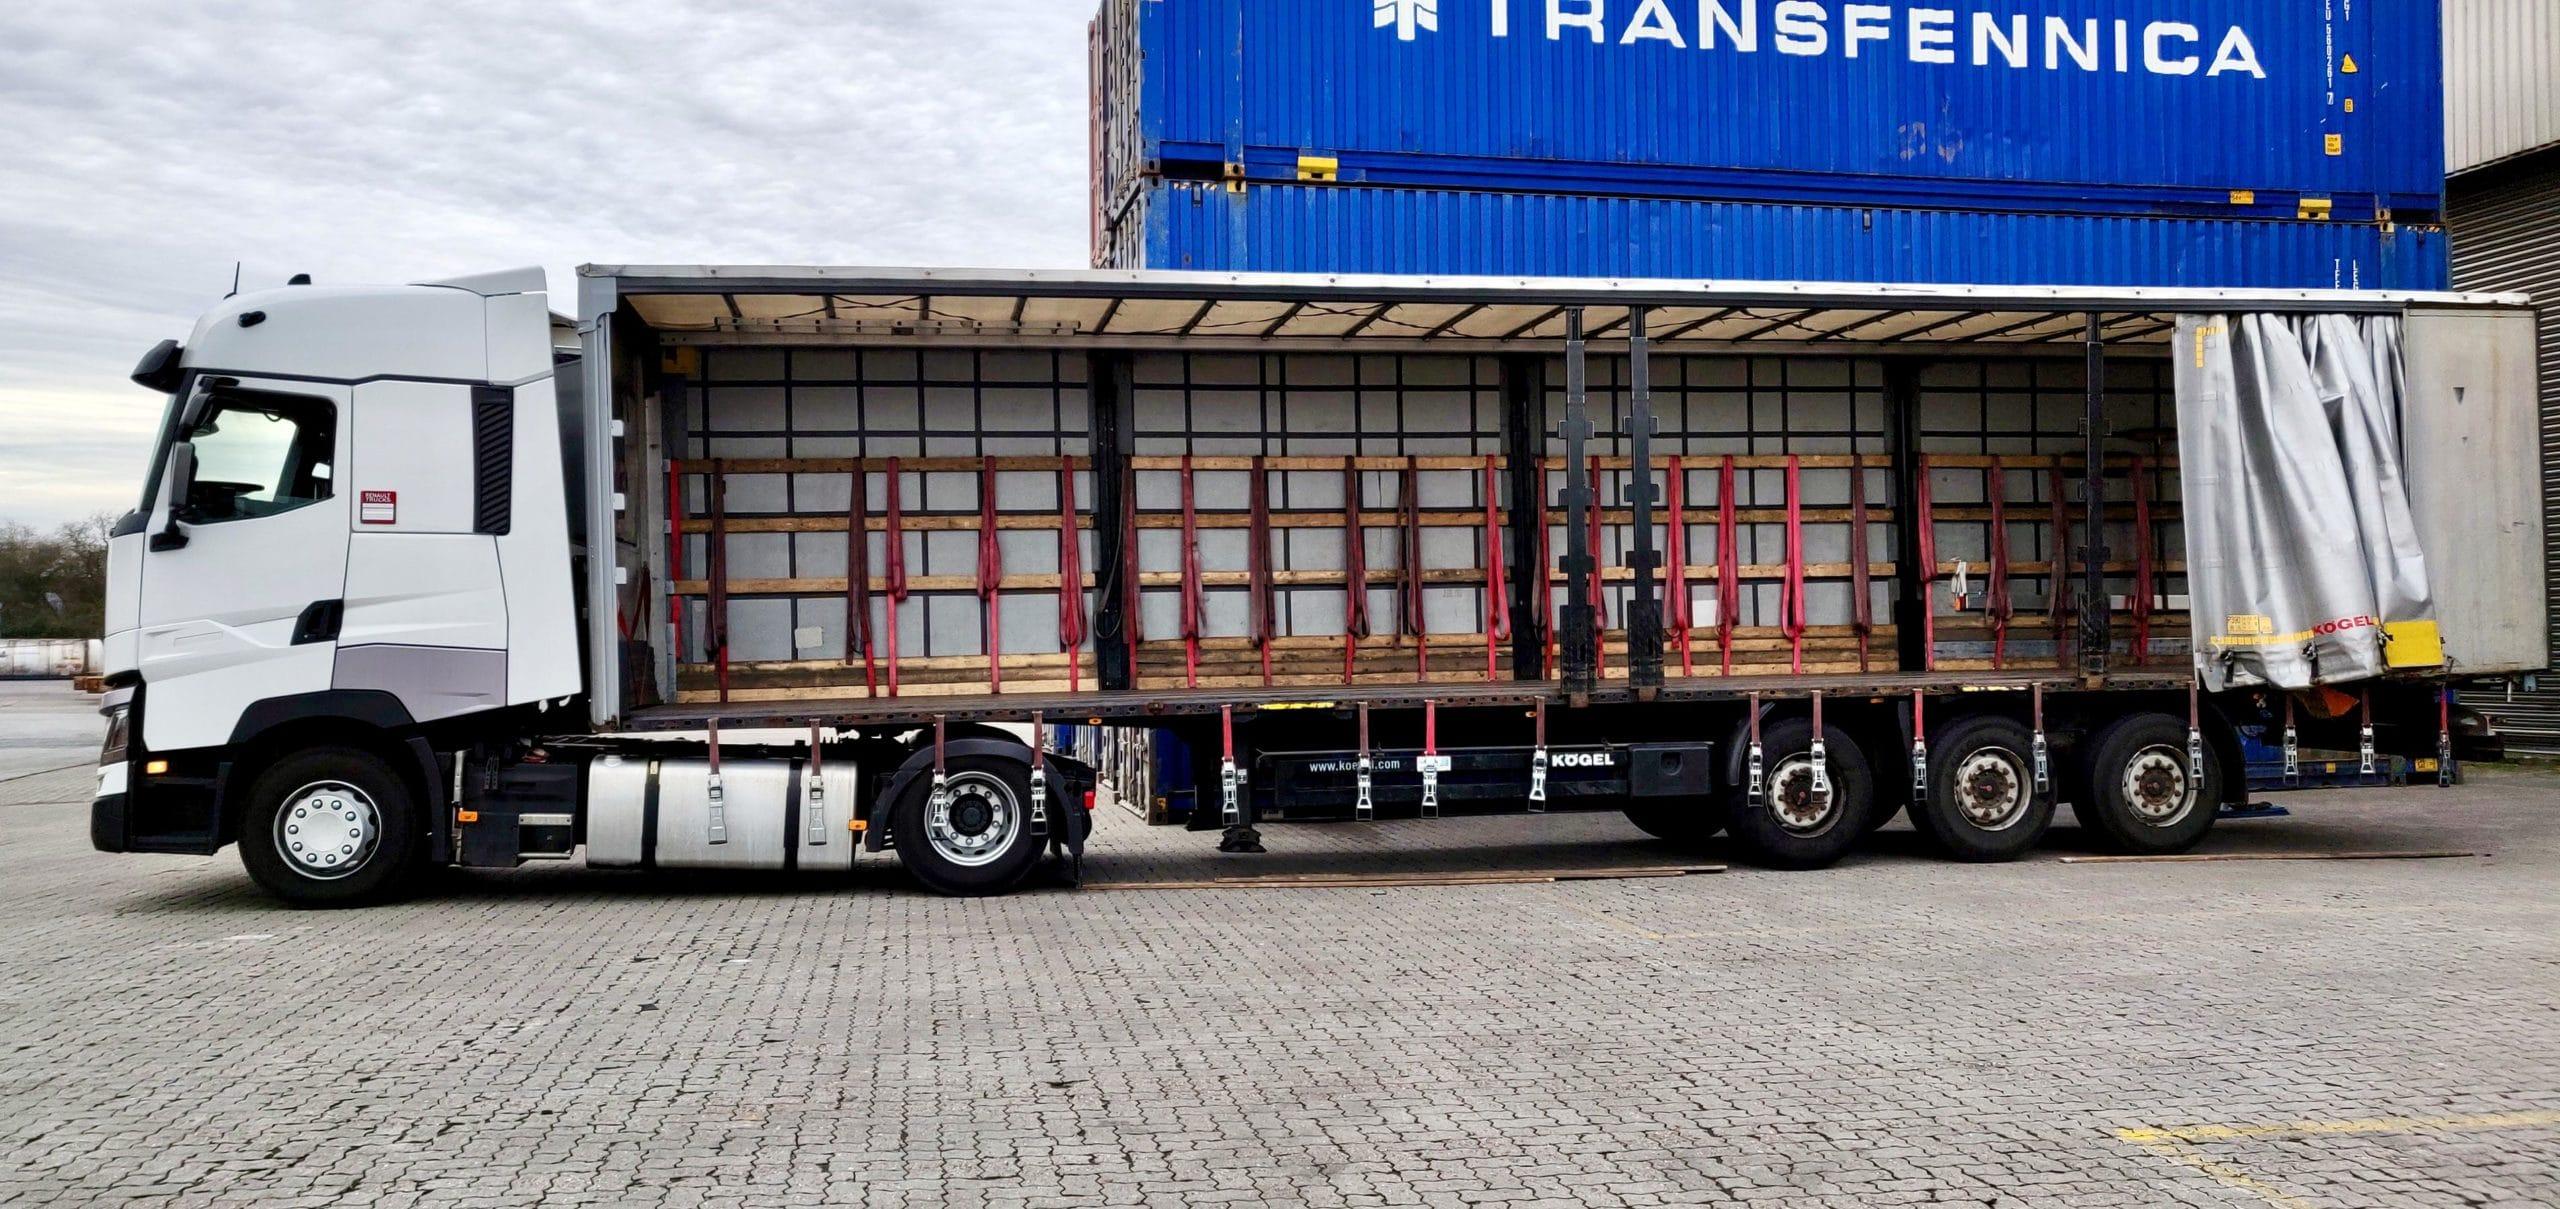 NEW trucks best - 2 of 8 resHqlt-60